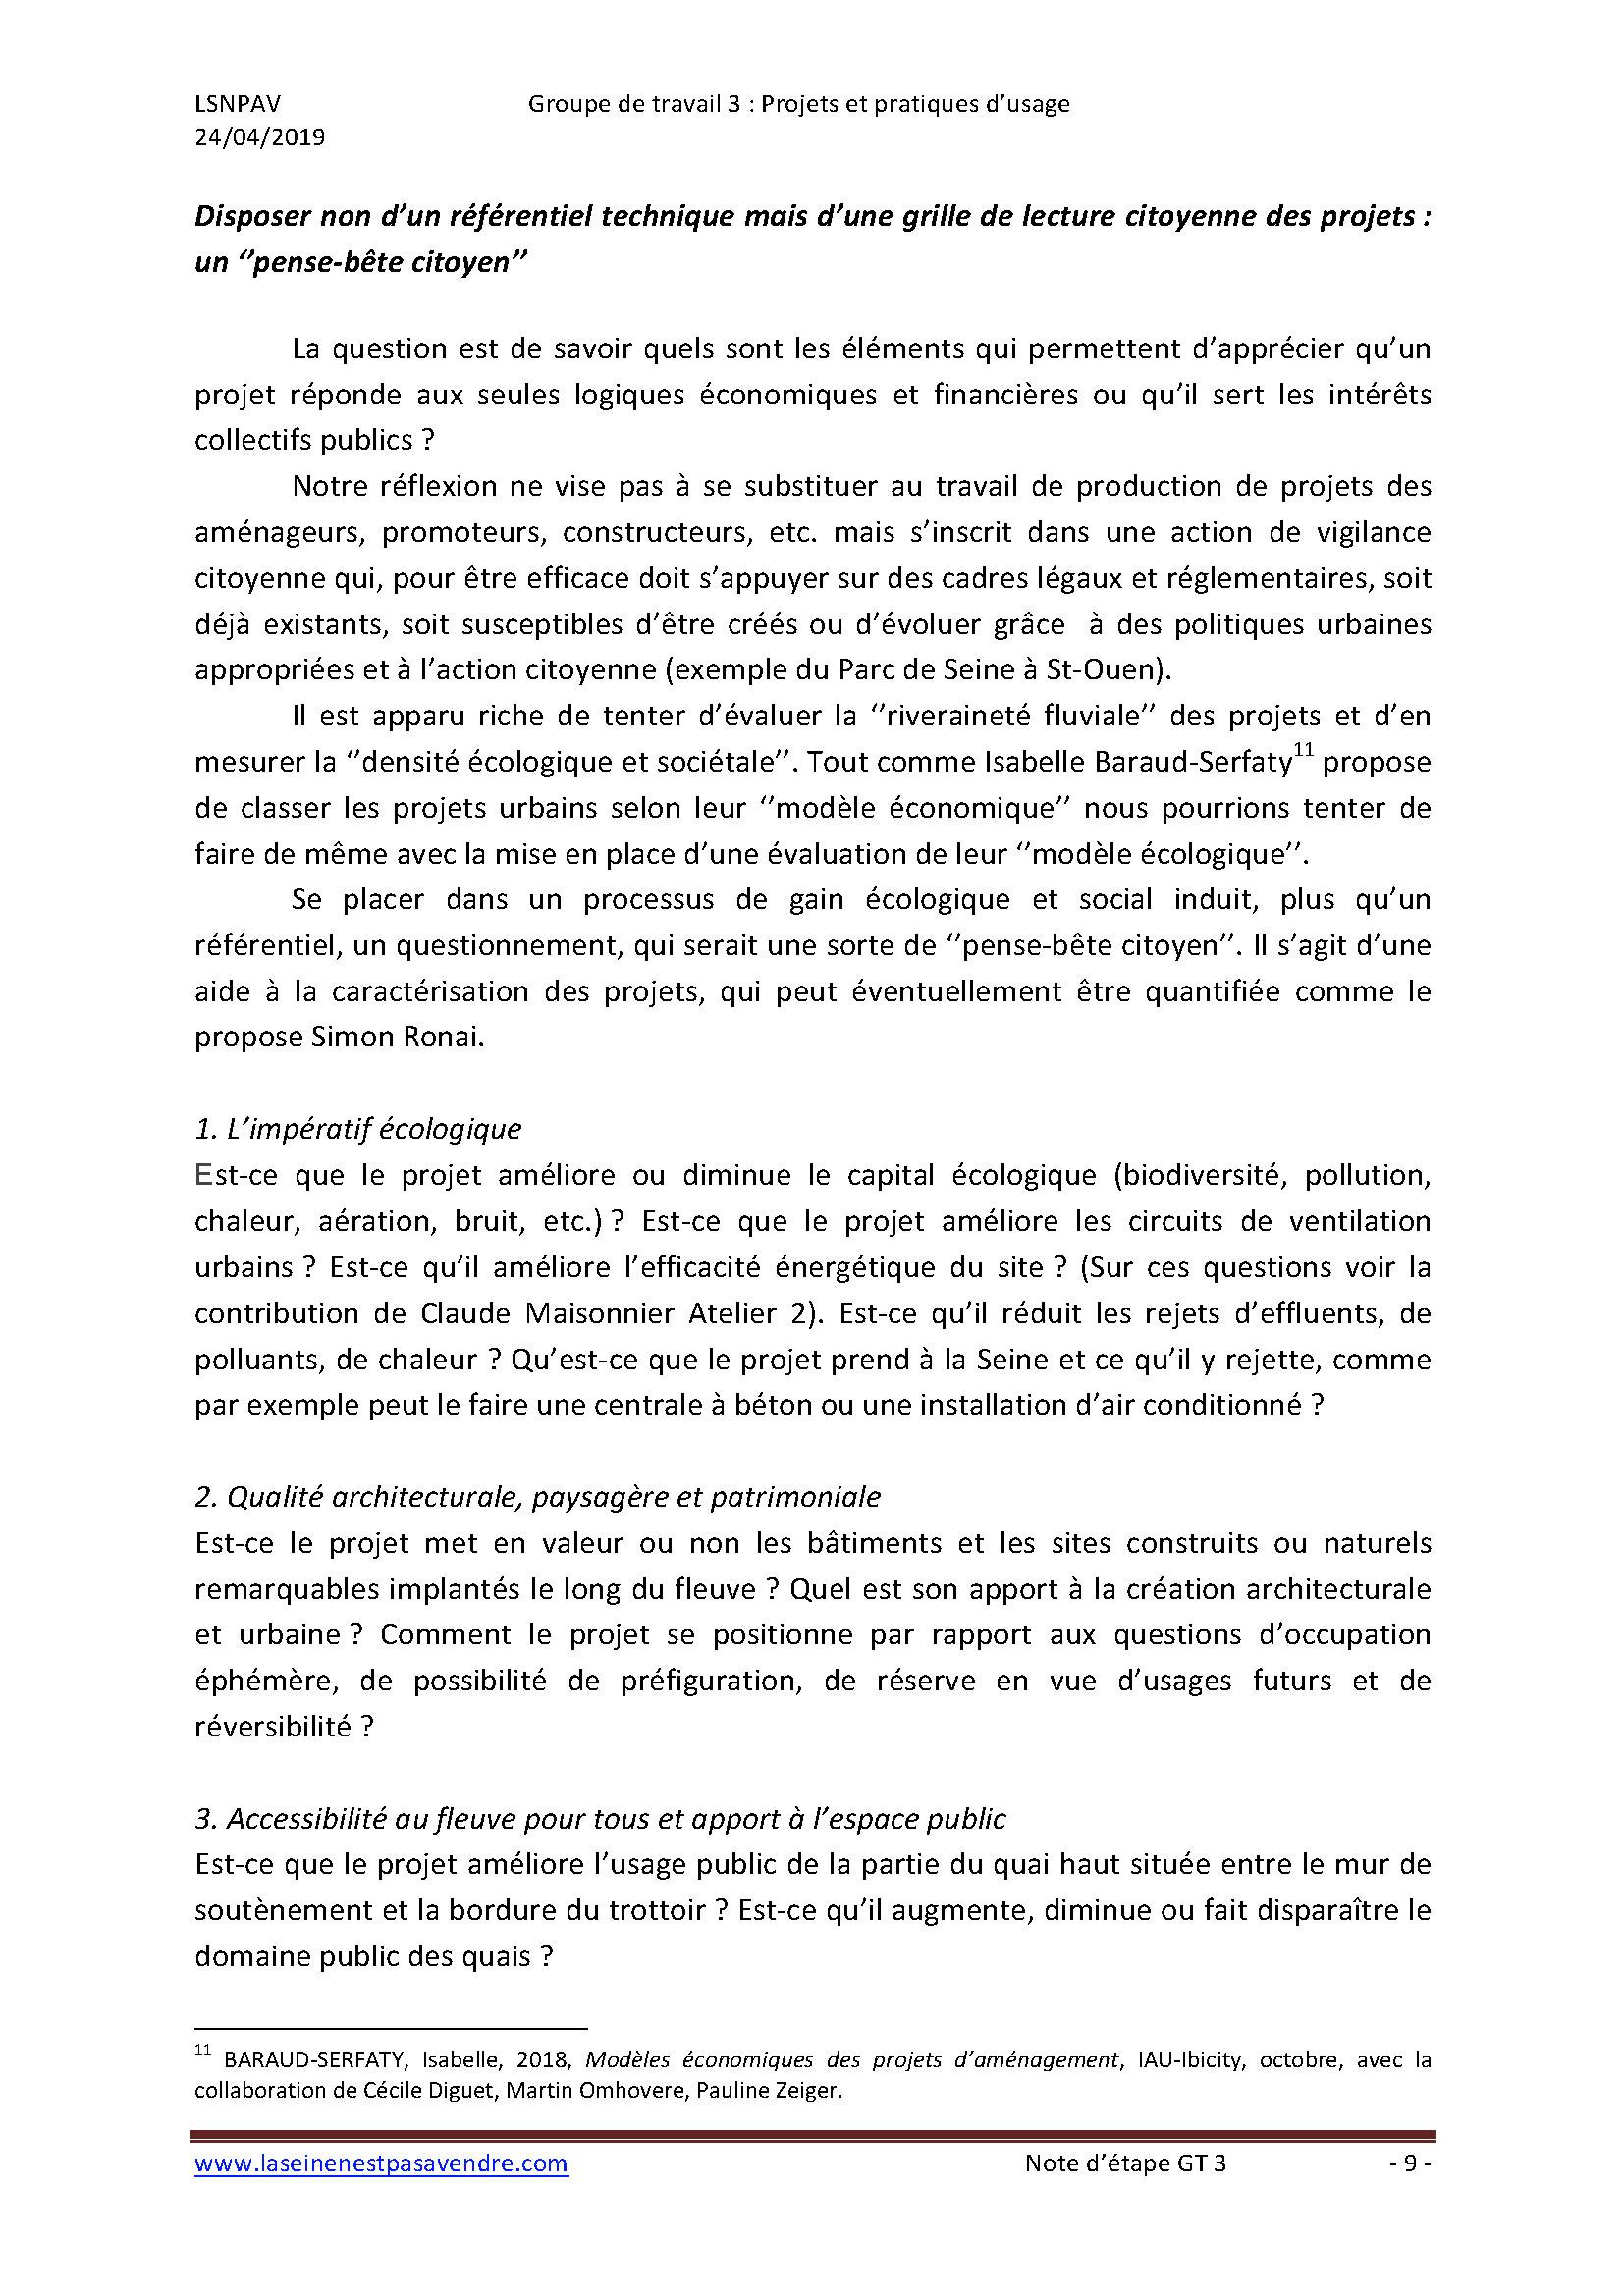 GT 3 Note d'étape_Page_09.jpg